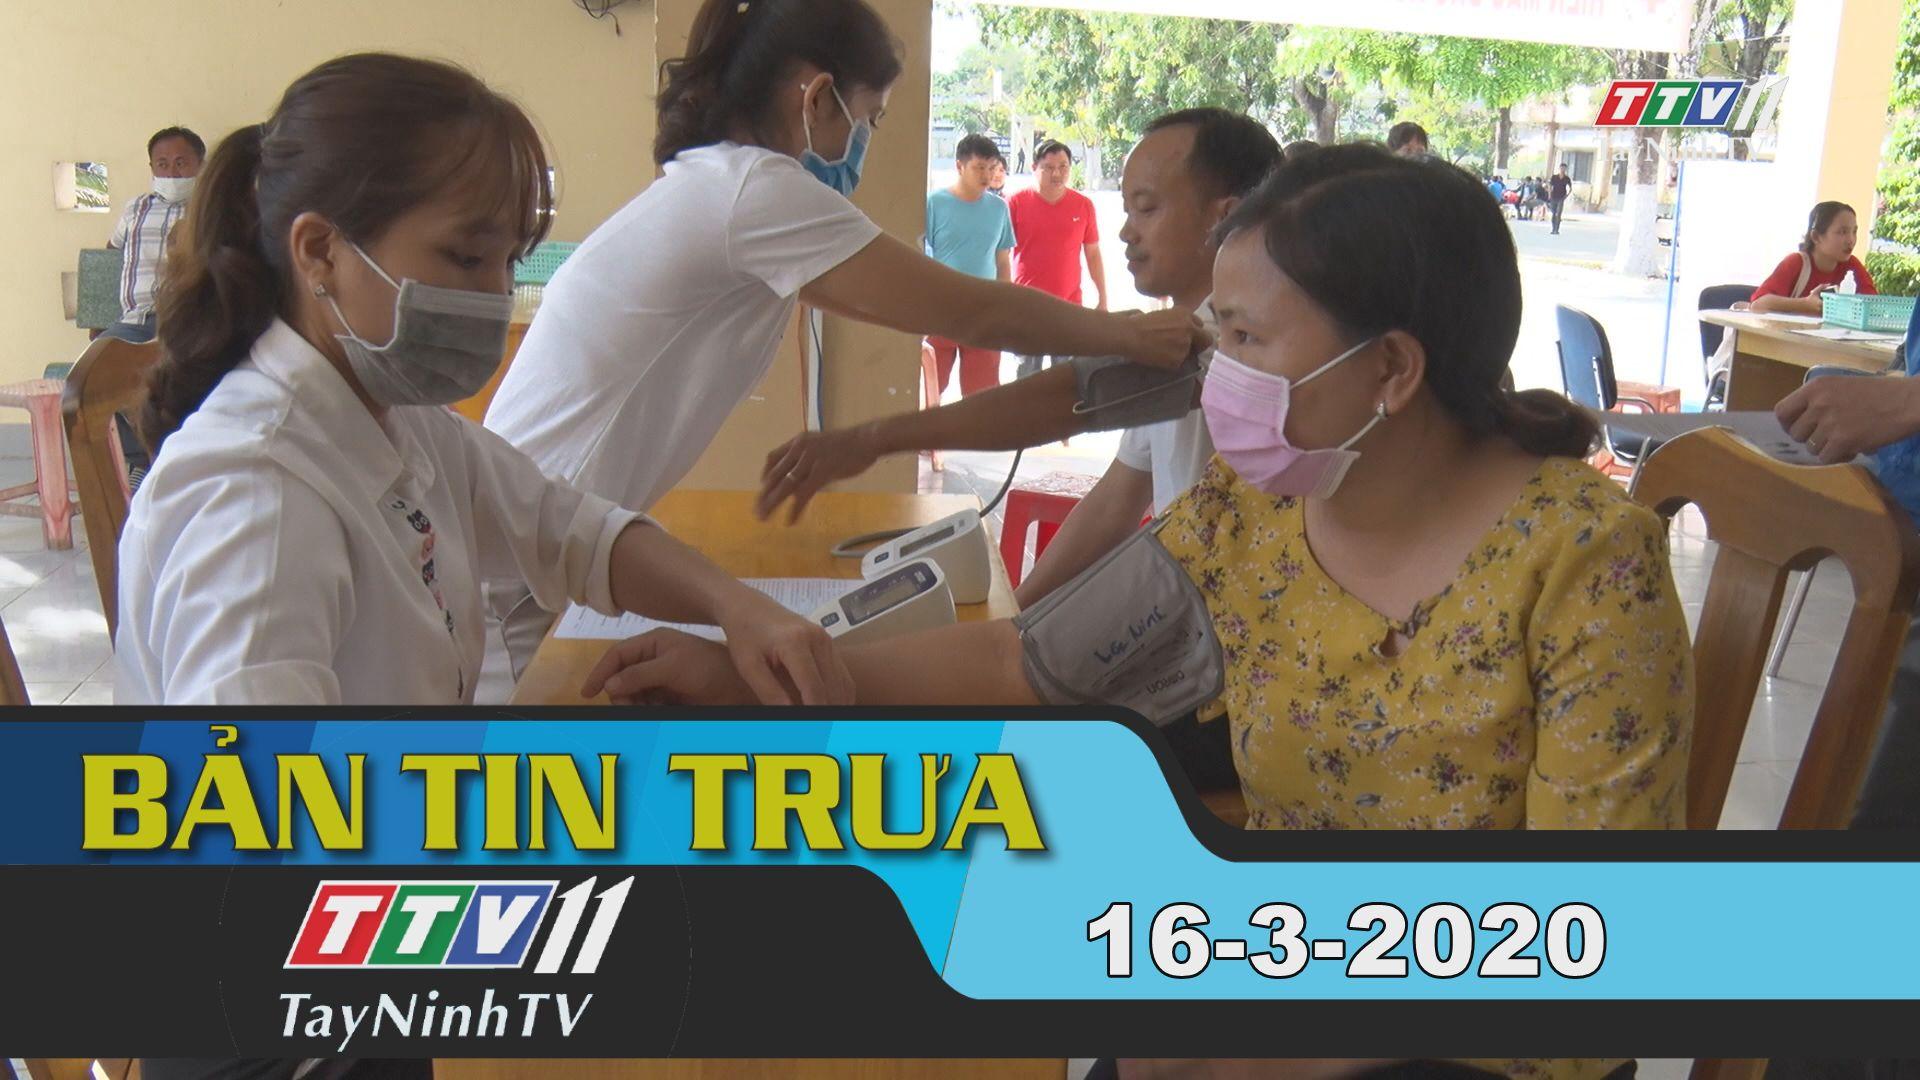 Bản tin trưa 16-3-2020 | Tin tức hôm nay | TayNinhTV